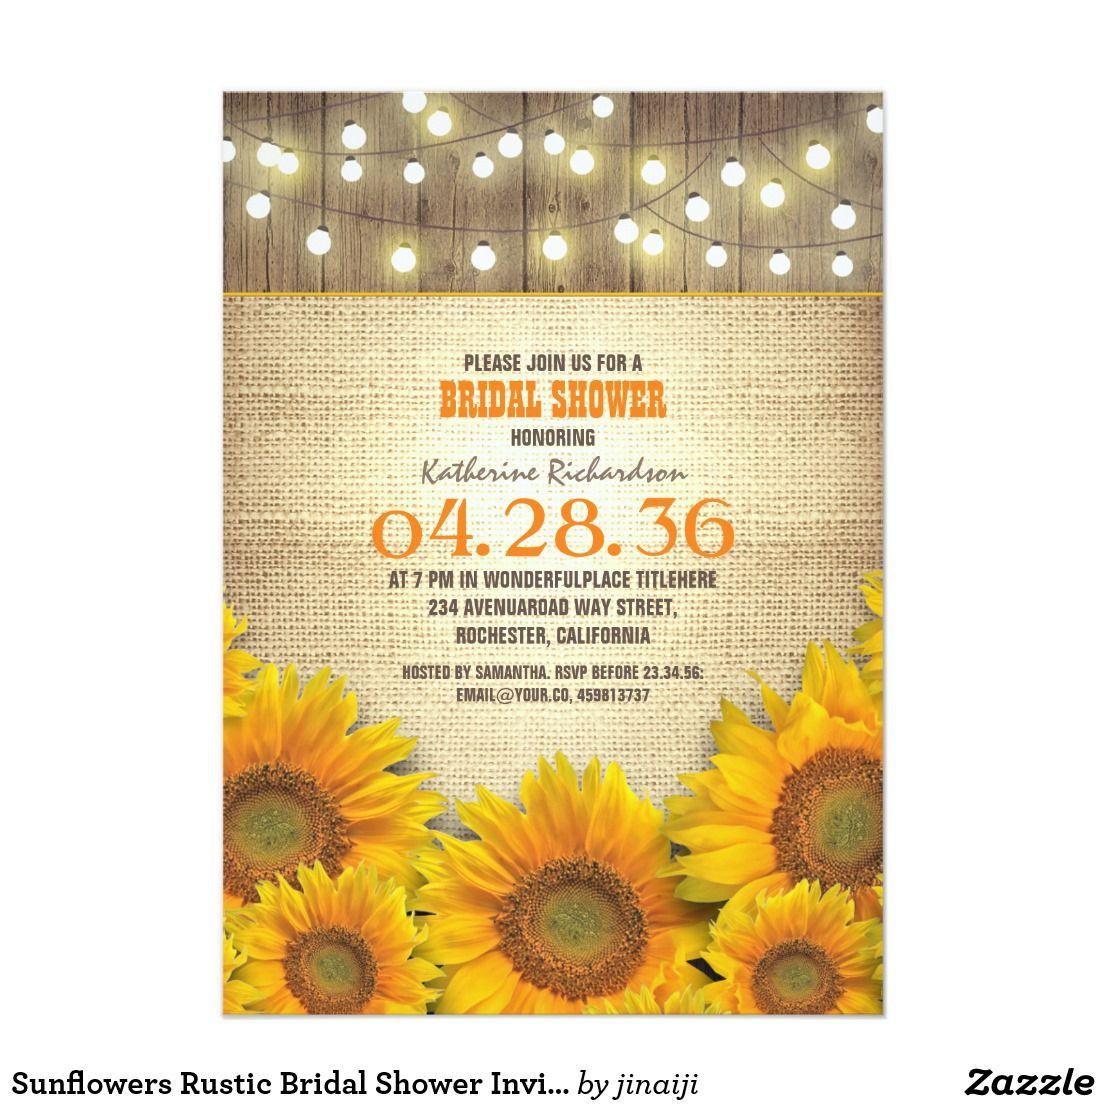 Sunflowers Rustic Bridal Shower Invitations | Rustic bridal showers ...